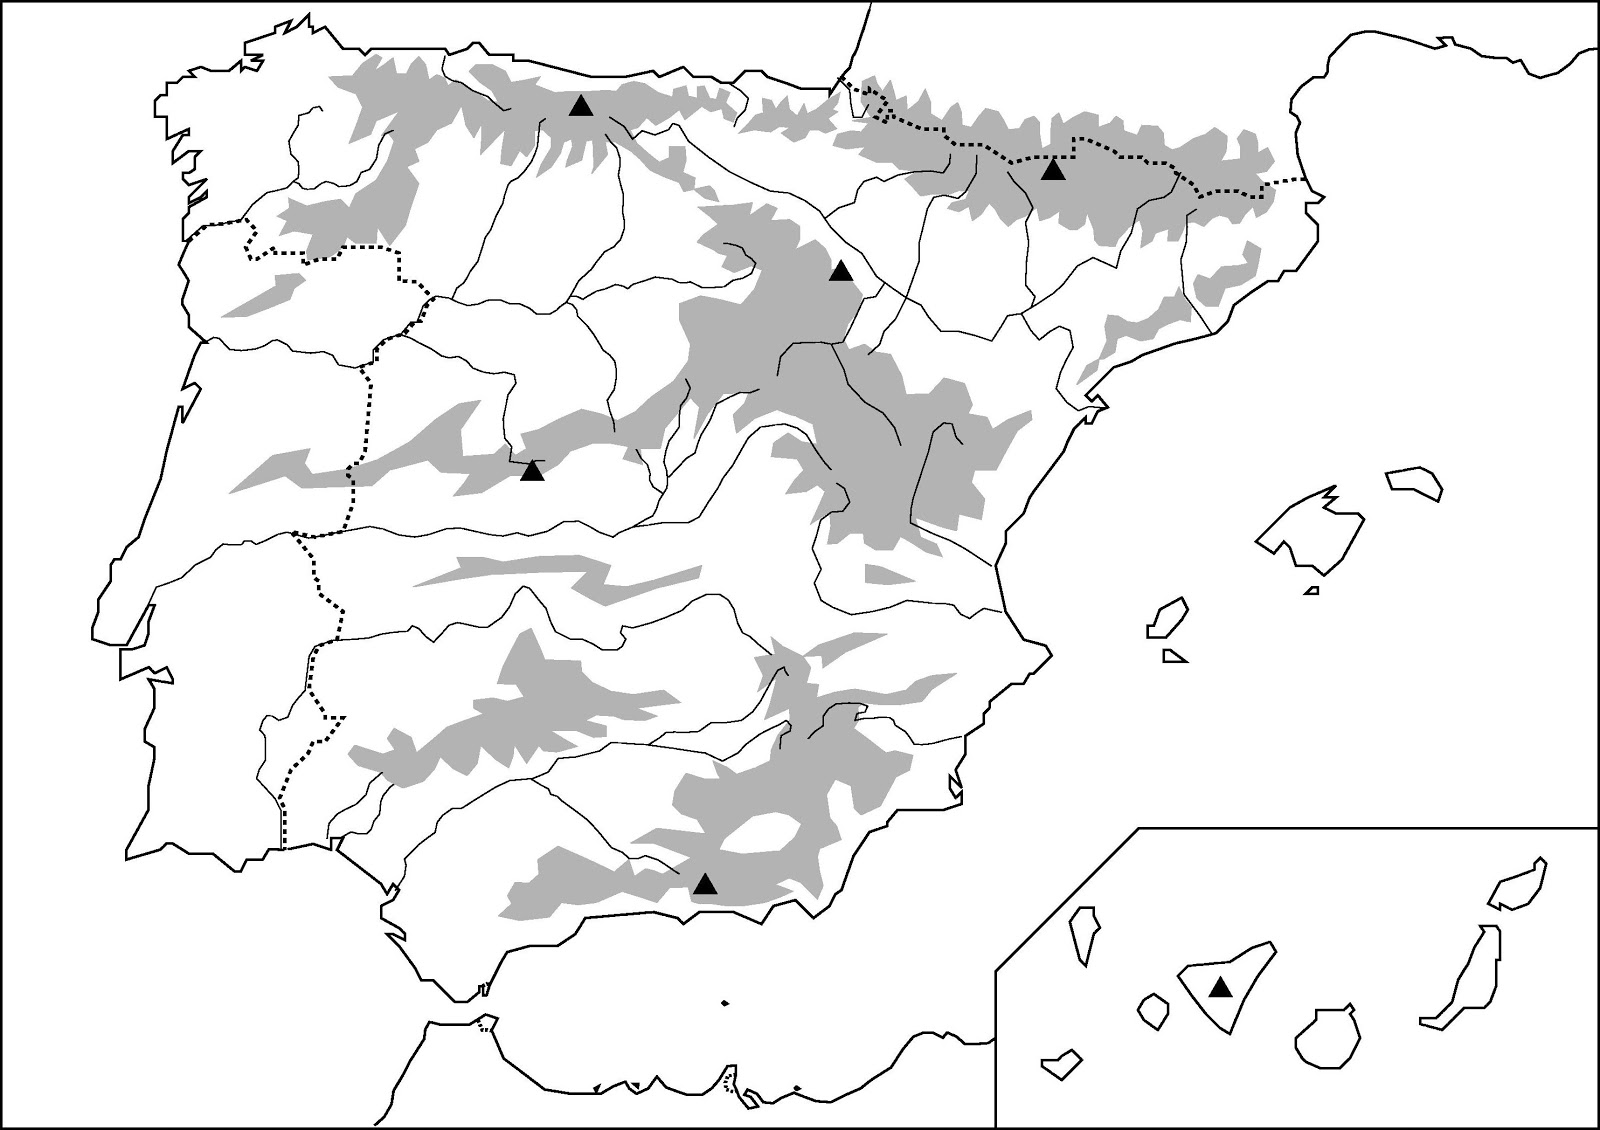 Mapa Politico De Espaa Pdf  My blog